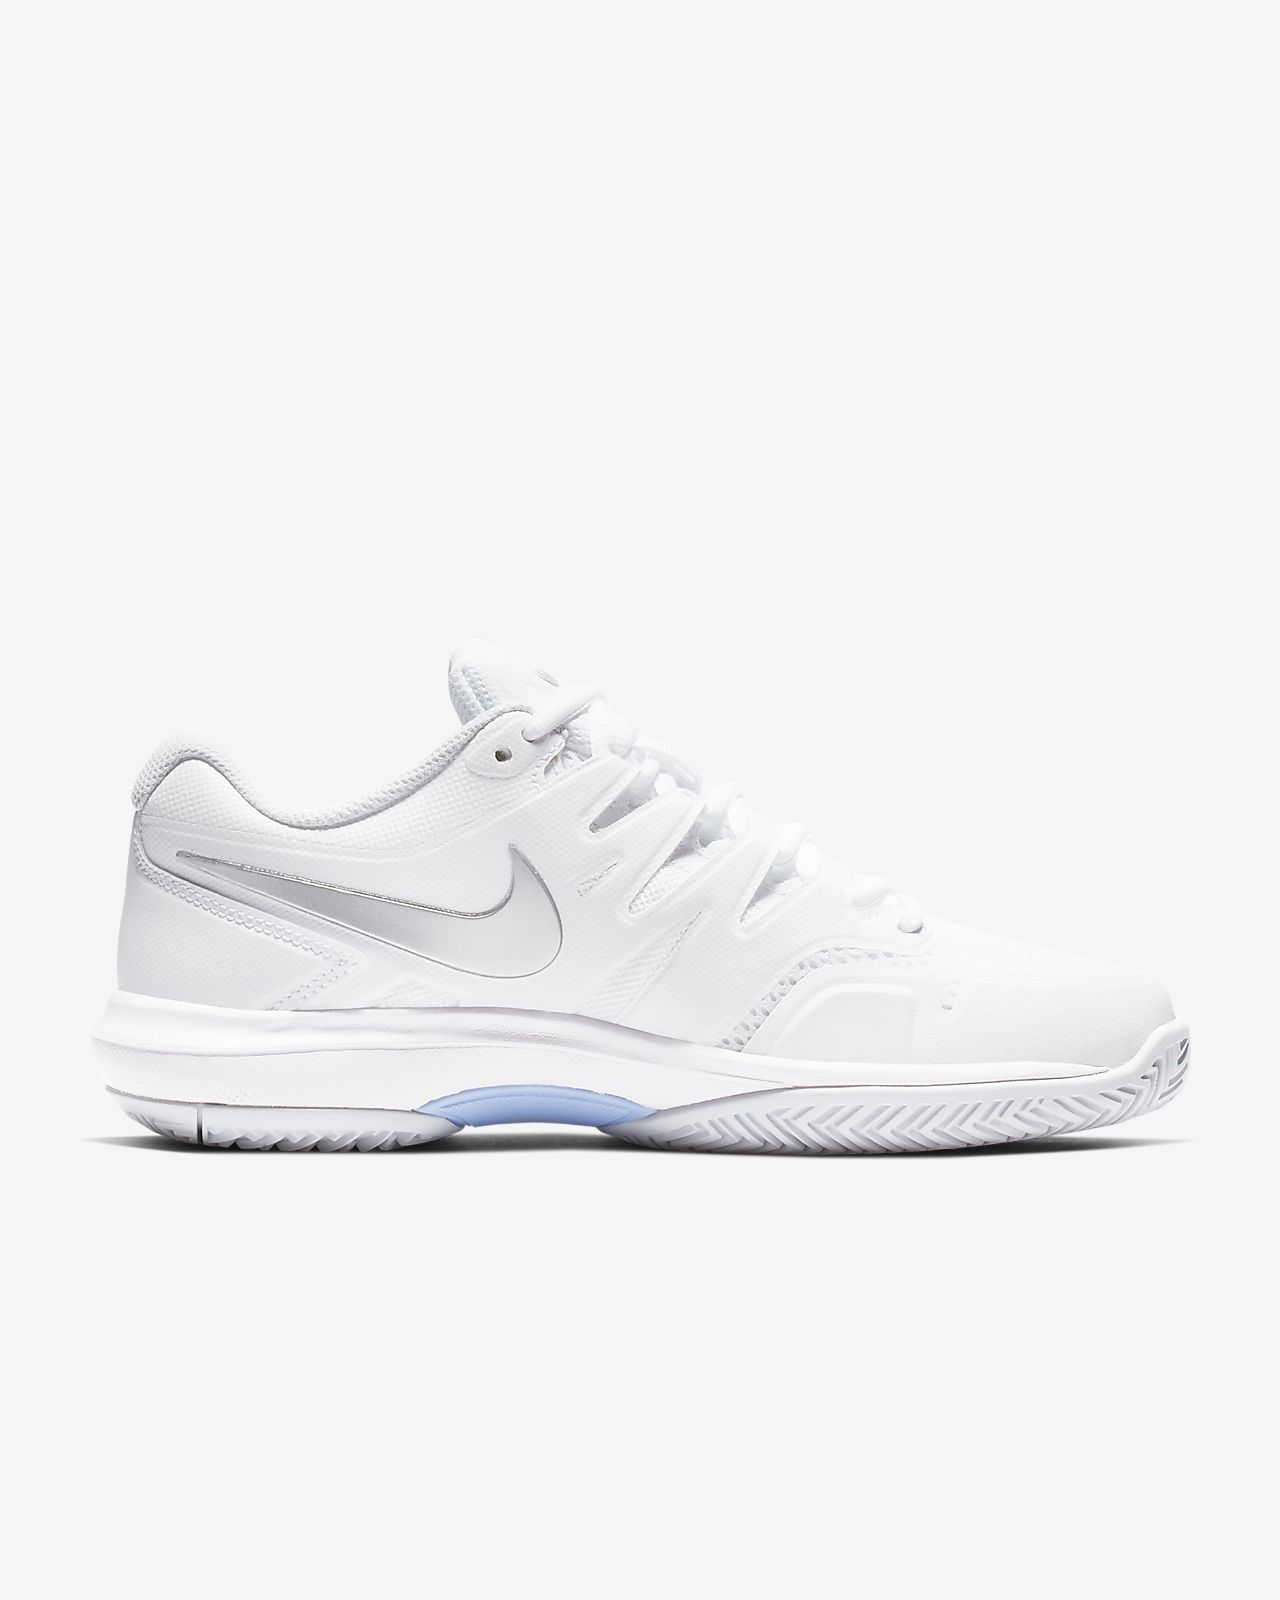 NikeCourt Air Zoom Prestige Women's Hard Court Tennis Shoe